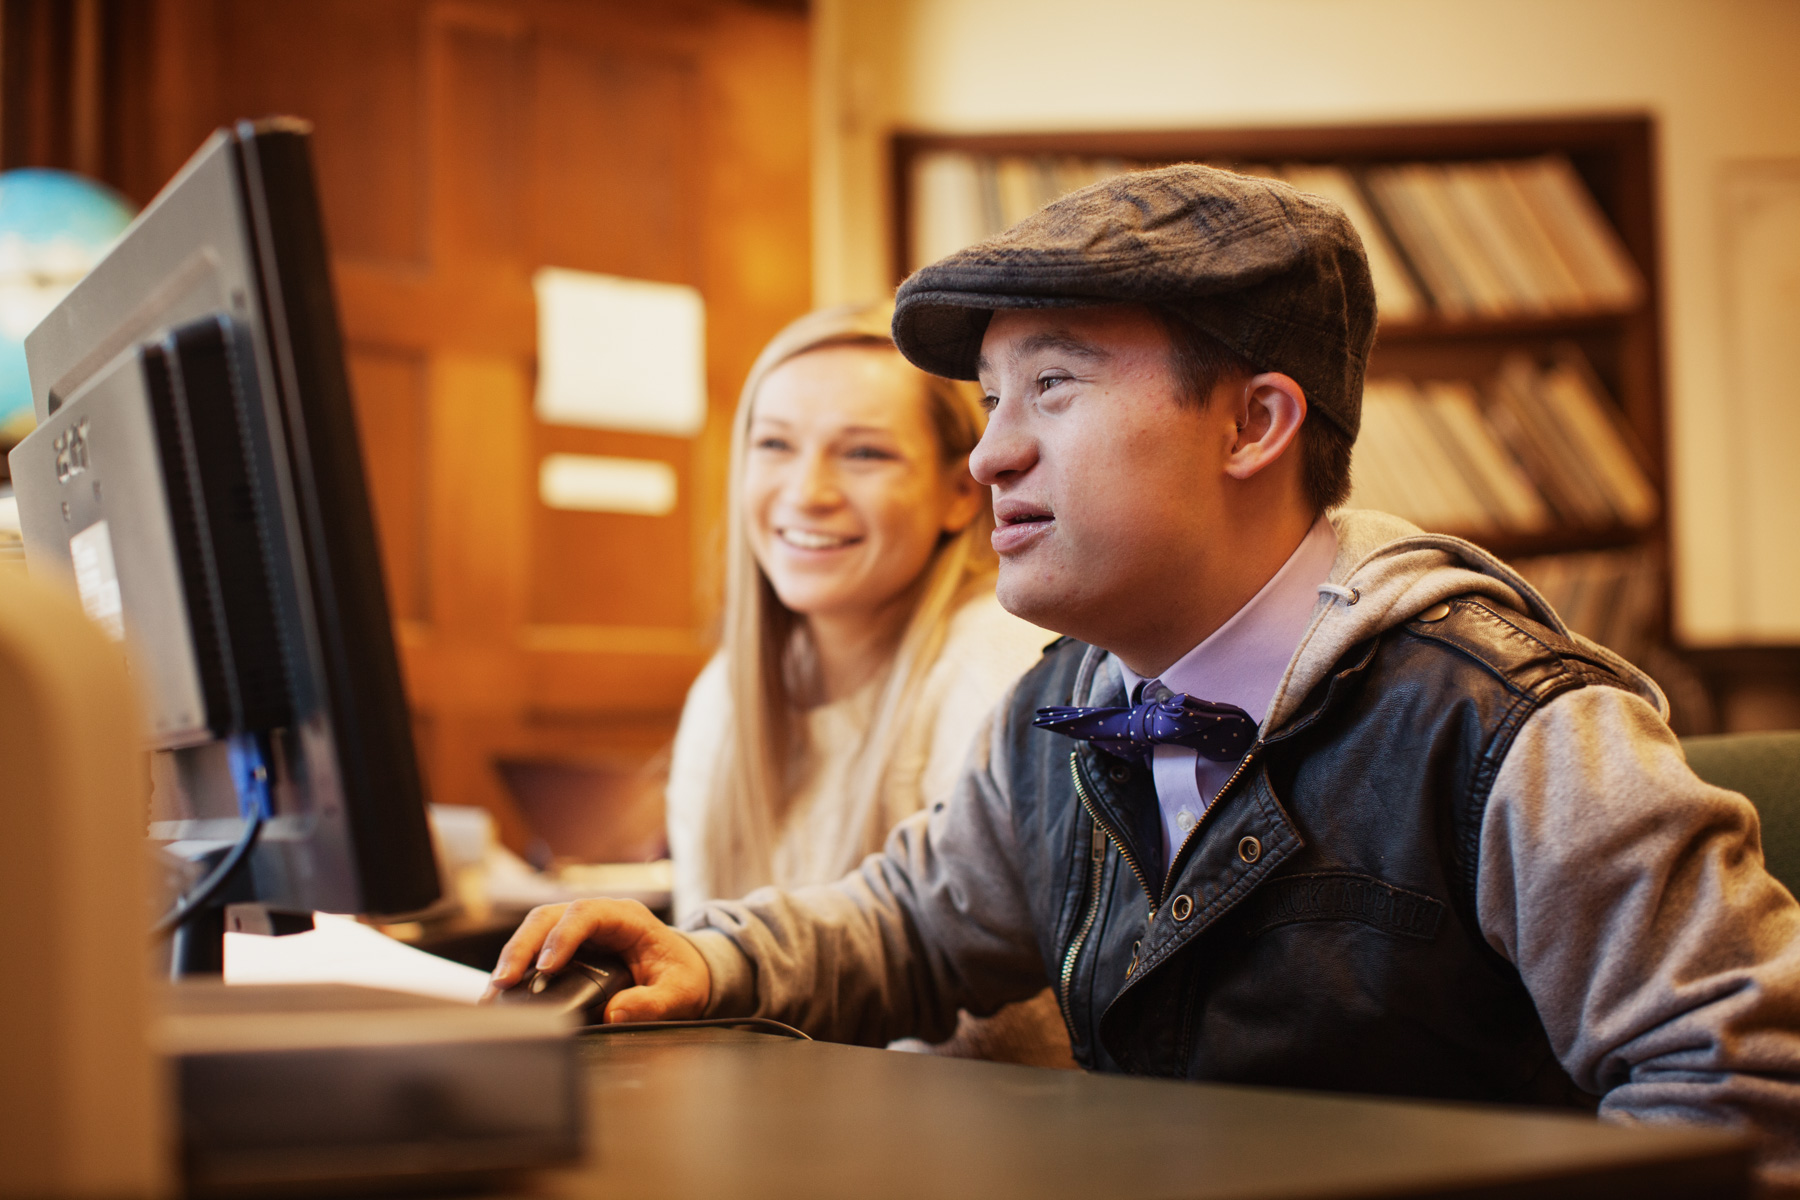 deaf-computer-education-1.jpg